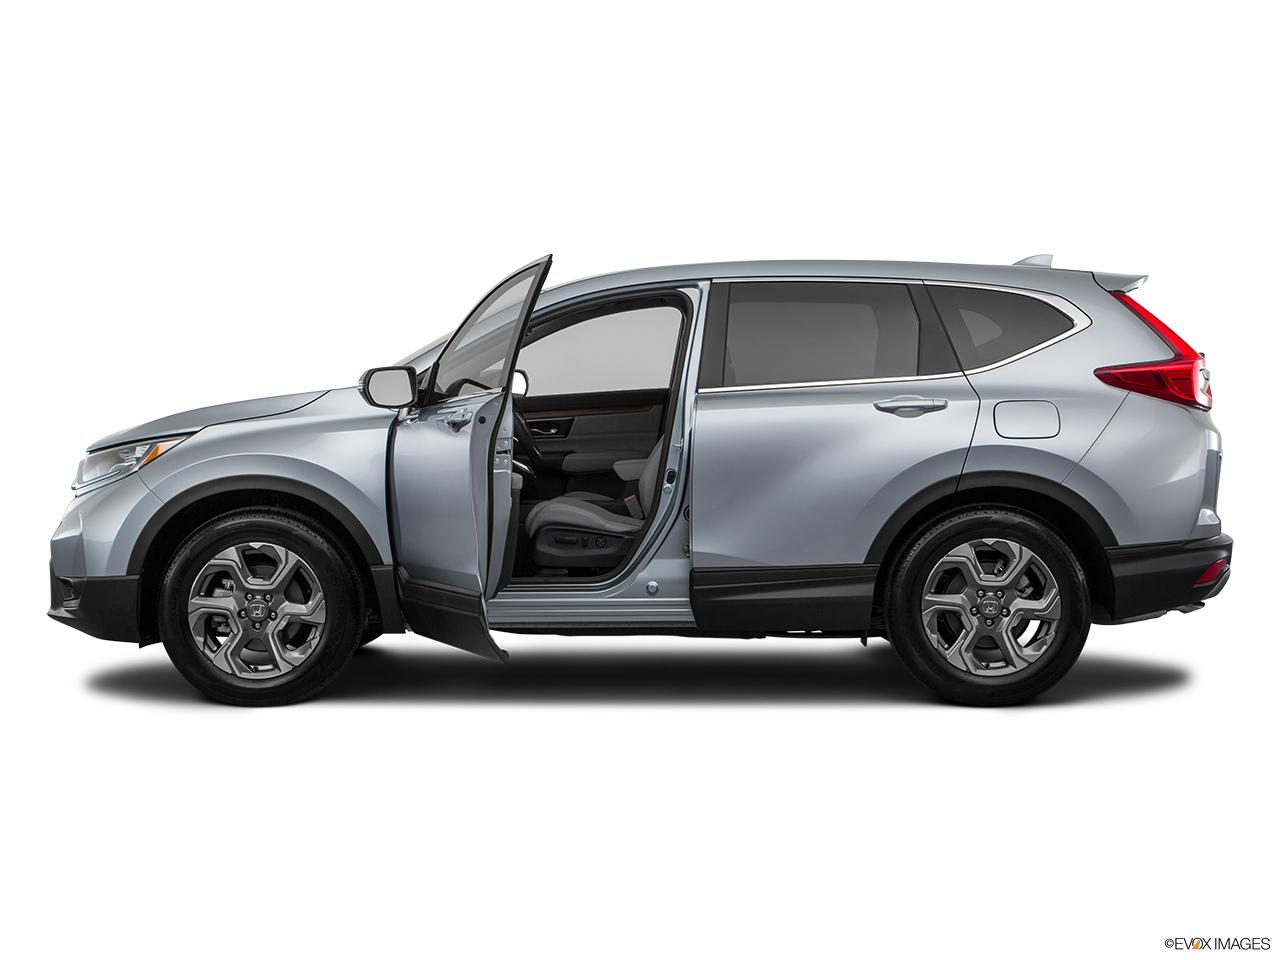 car features list for honda cr v 2017 lx plus 2wd oman yallamotor. Black Bedroom Furniture Sets. Home Design Ideas